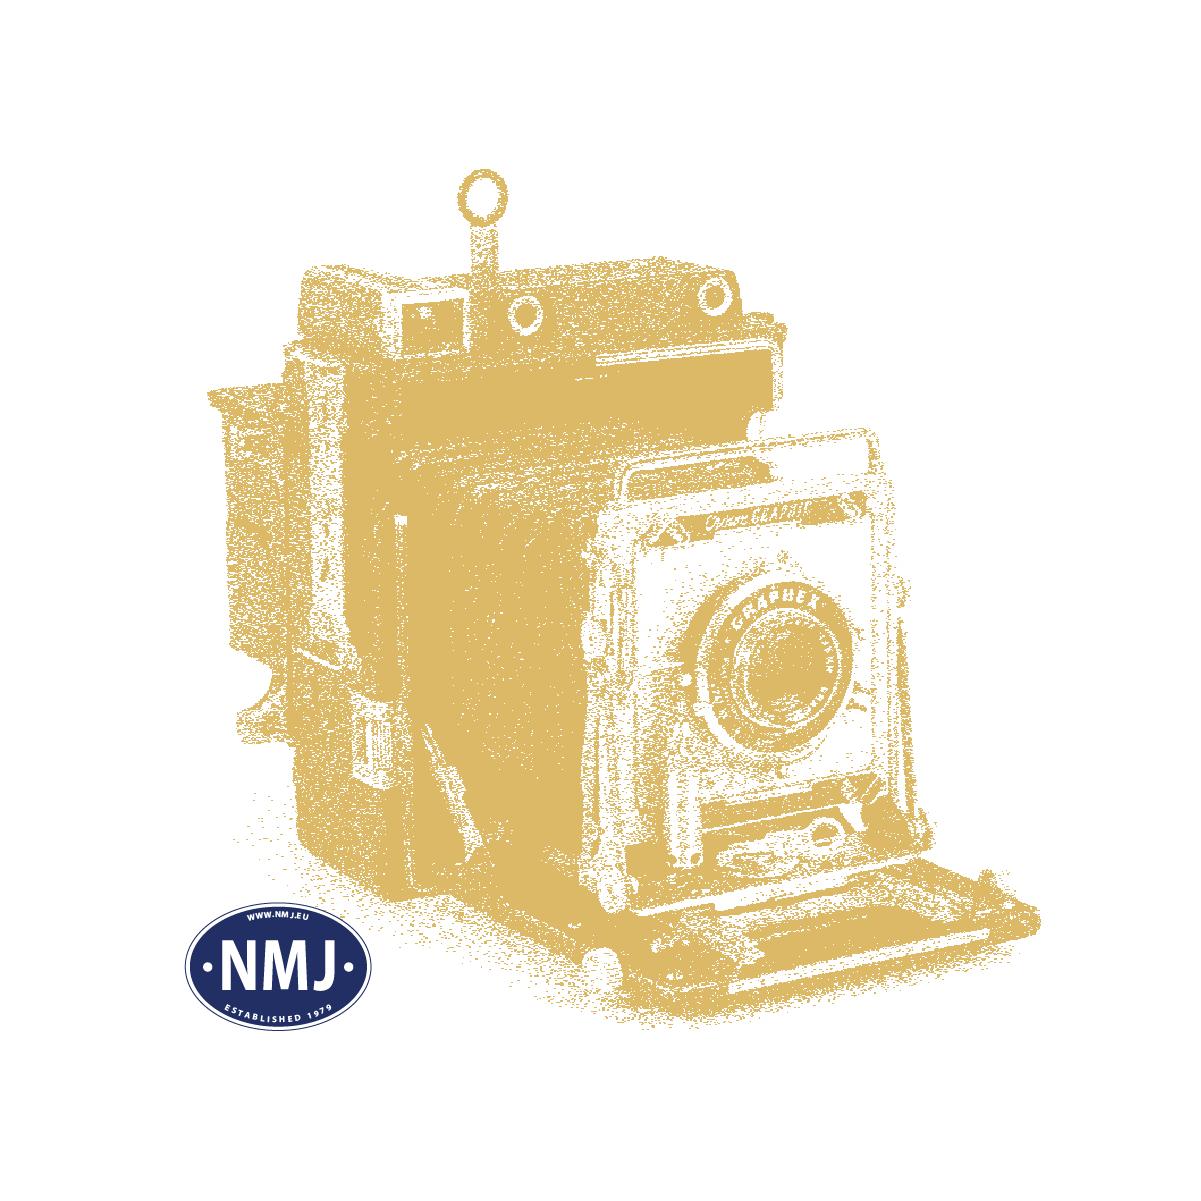 NMJT9927 - Rødbrune speil for El11